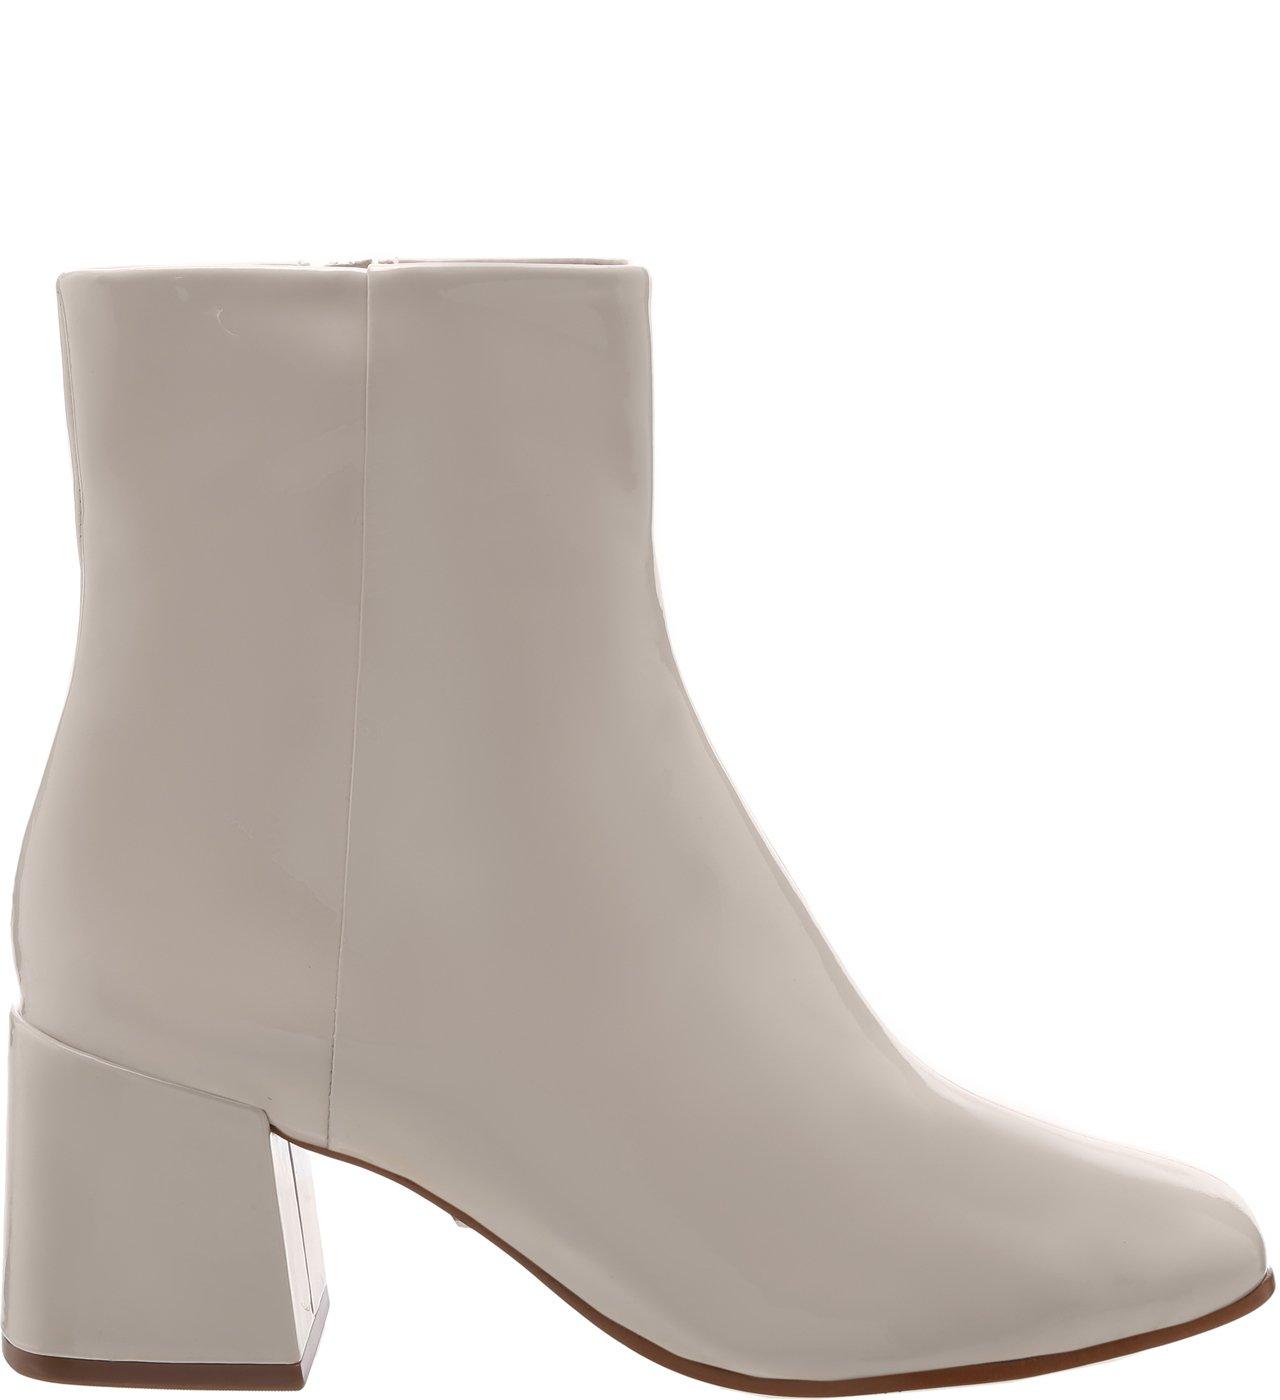 Bota Block Heel Verniz White | Schutz